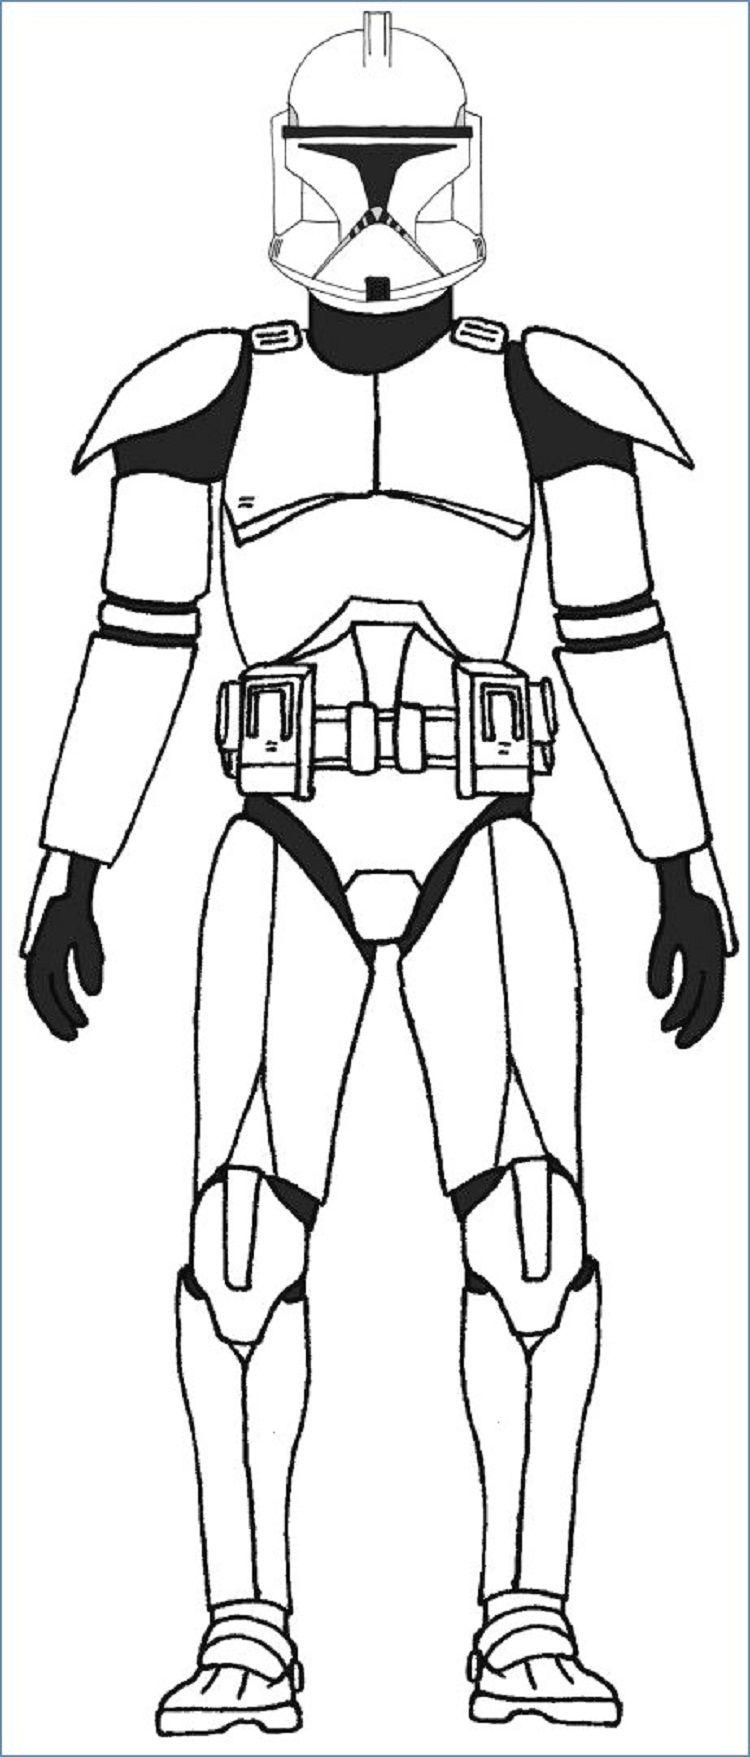 Star Wars Coloring Pages Captain Rex Coloringareas Com Star